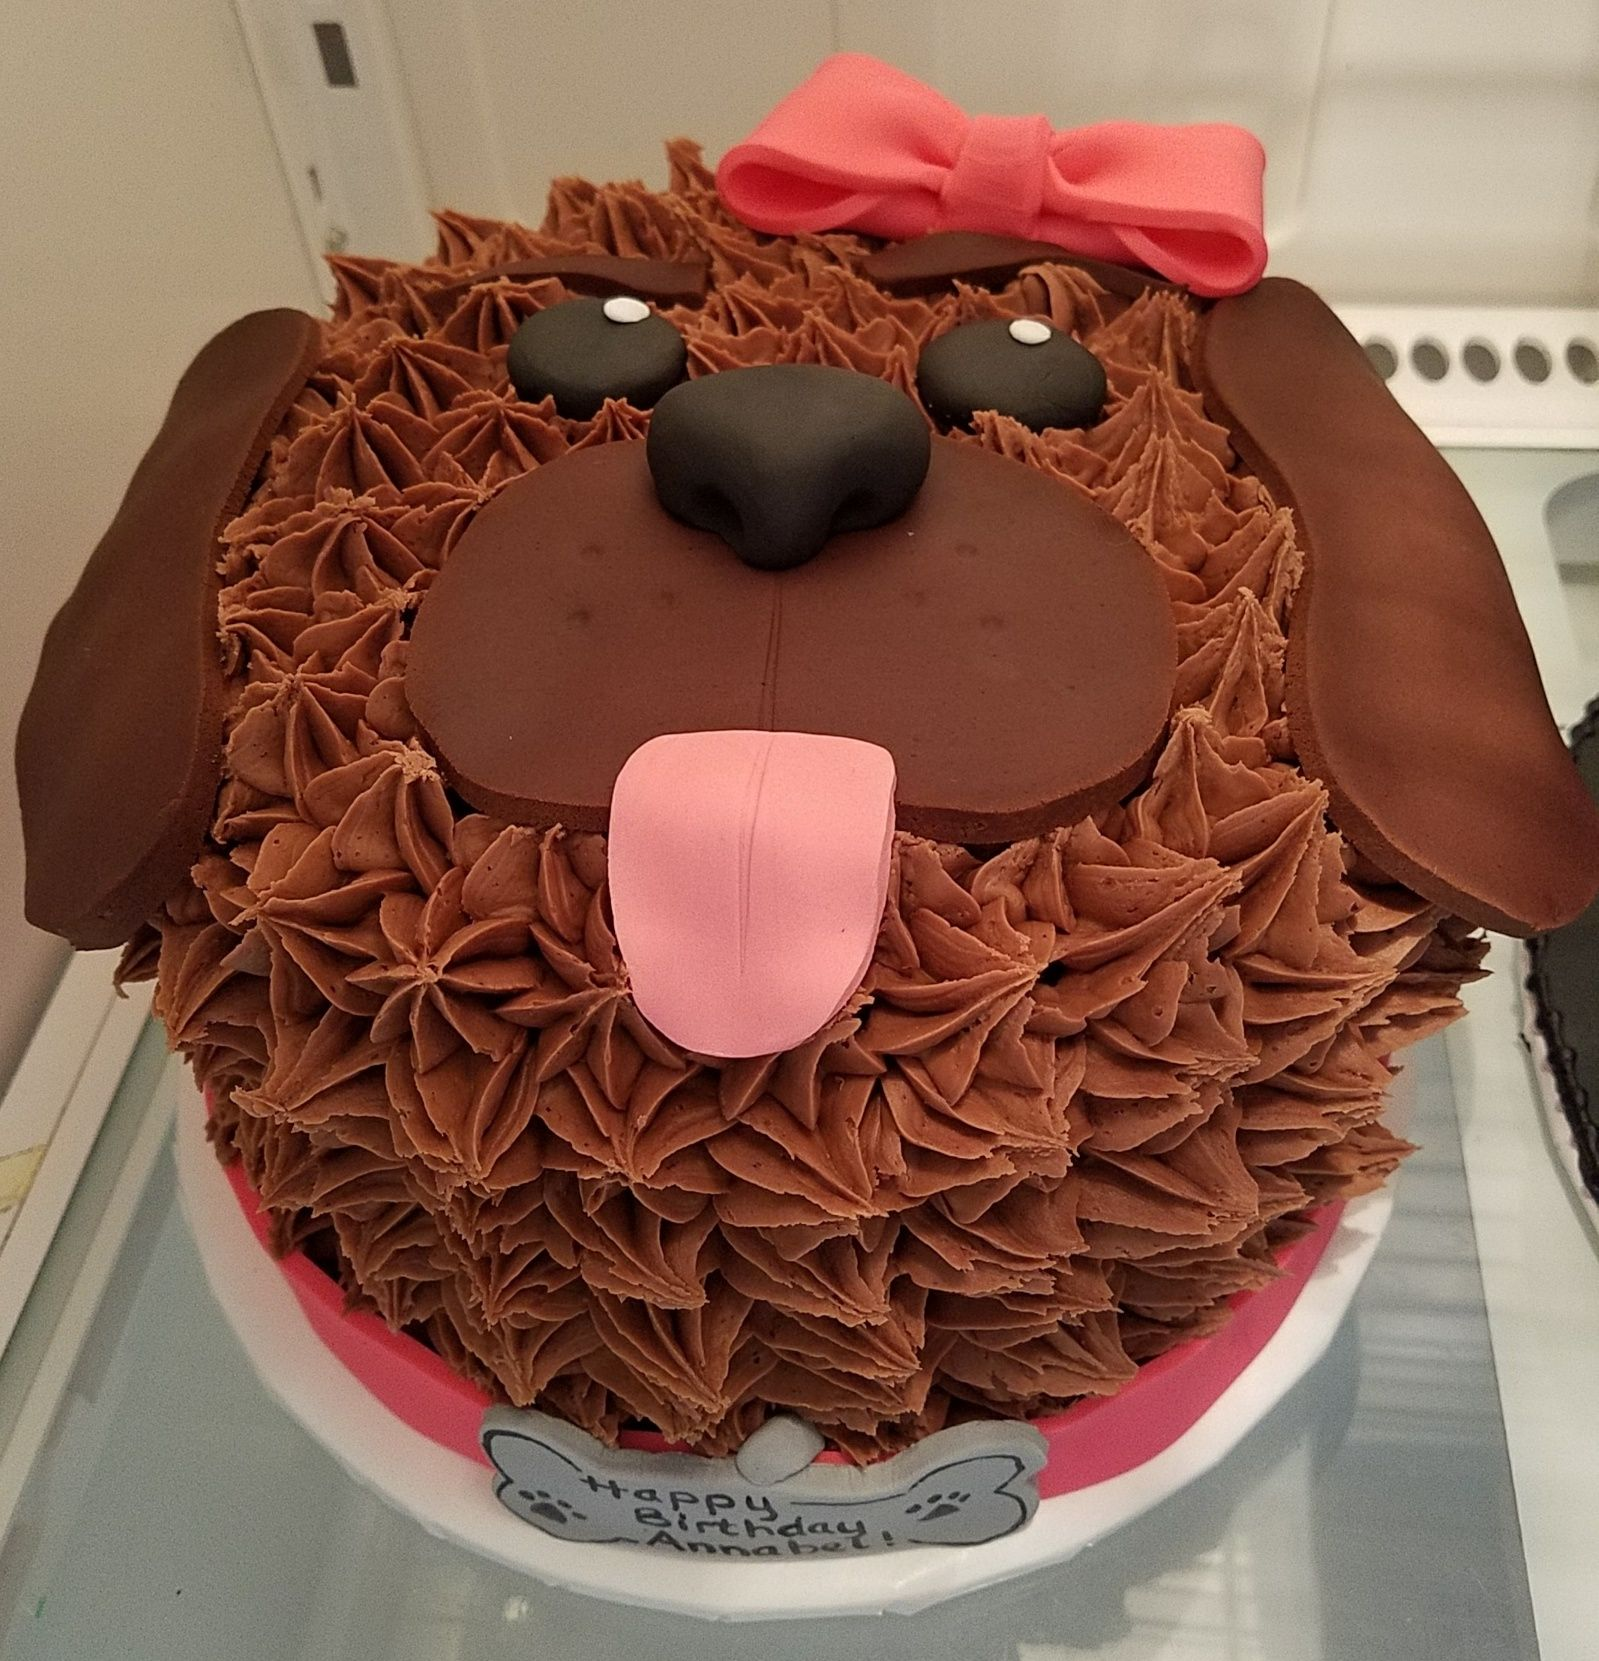 Sensational Puppy Dog Cake Adrienne Co Bakery With Images Puppy Funny Birthday Cards Online Inifodamsfinfo